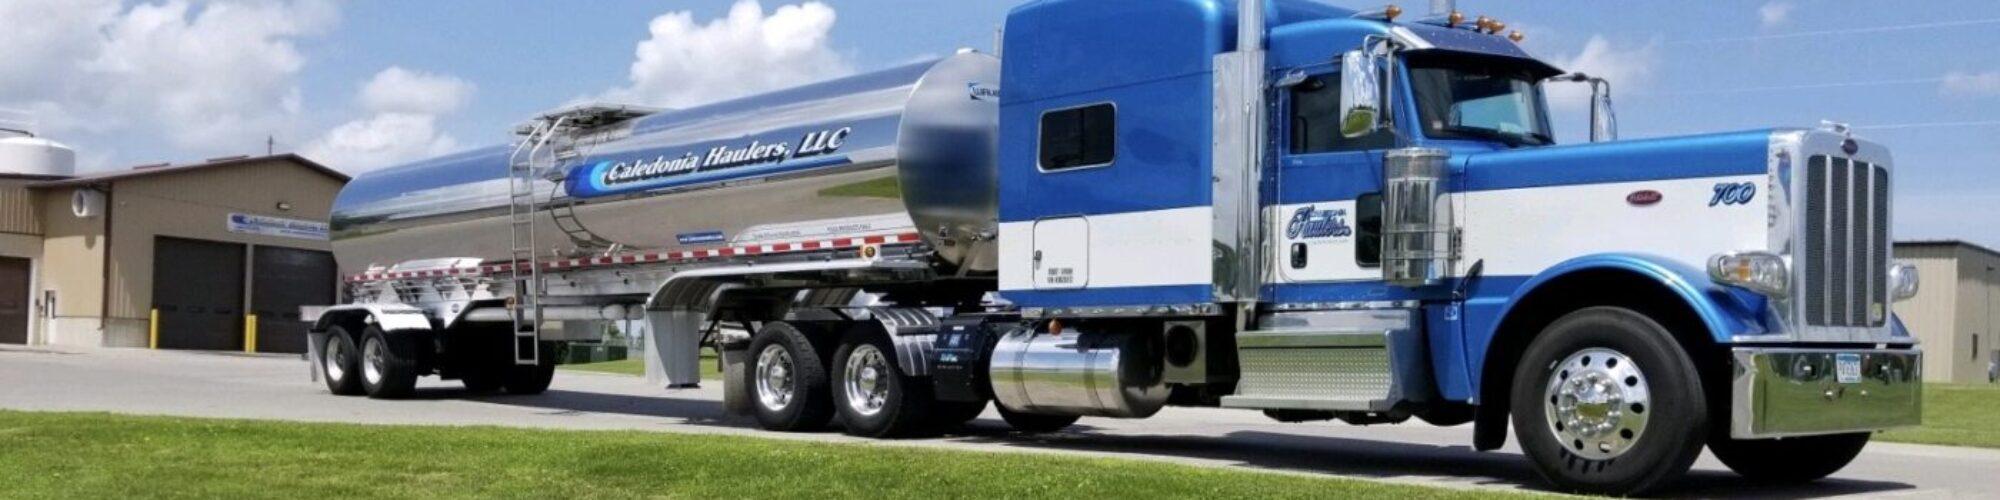 Caledonia Haulers Milk Truck